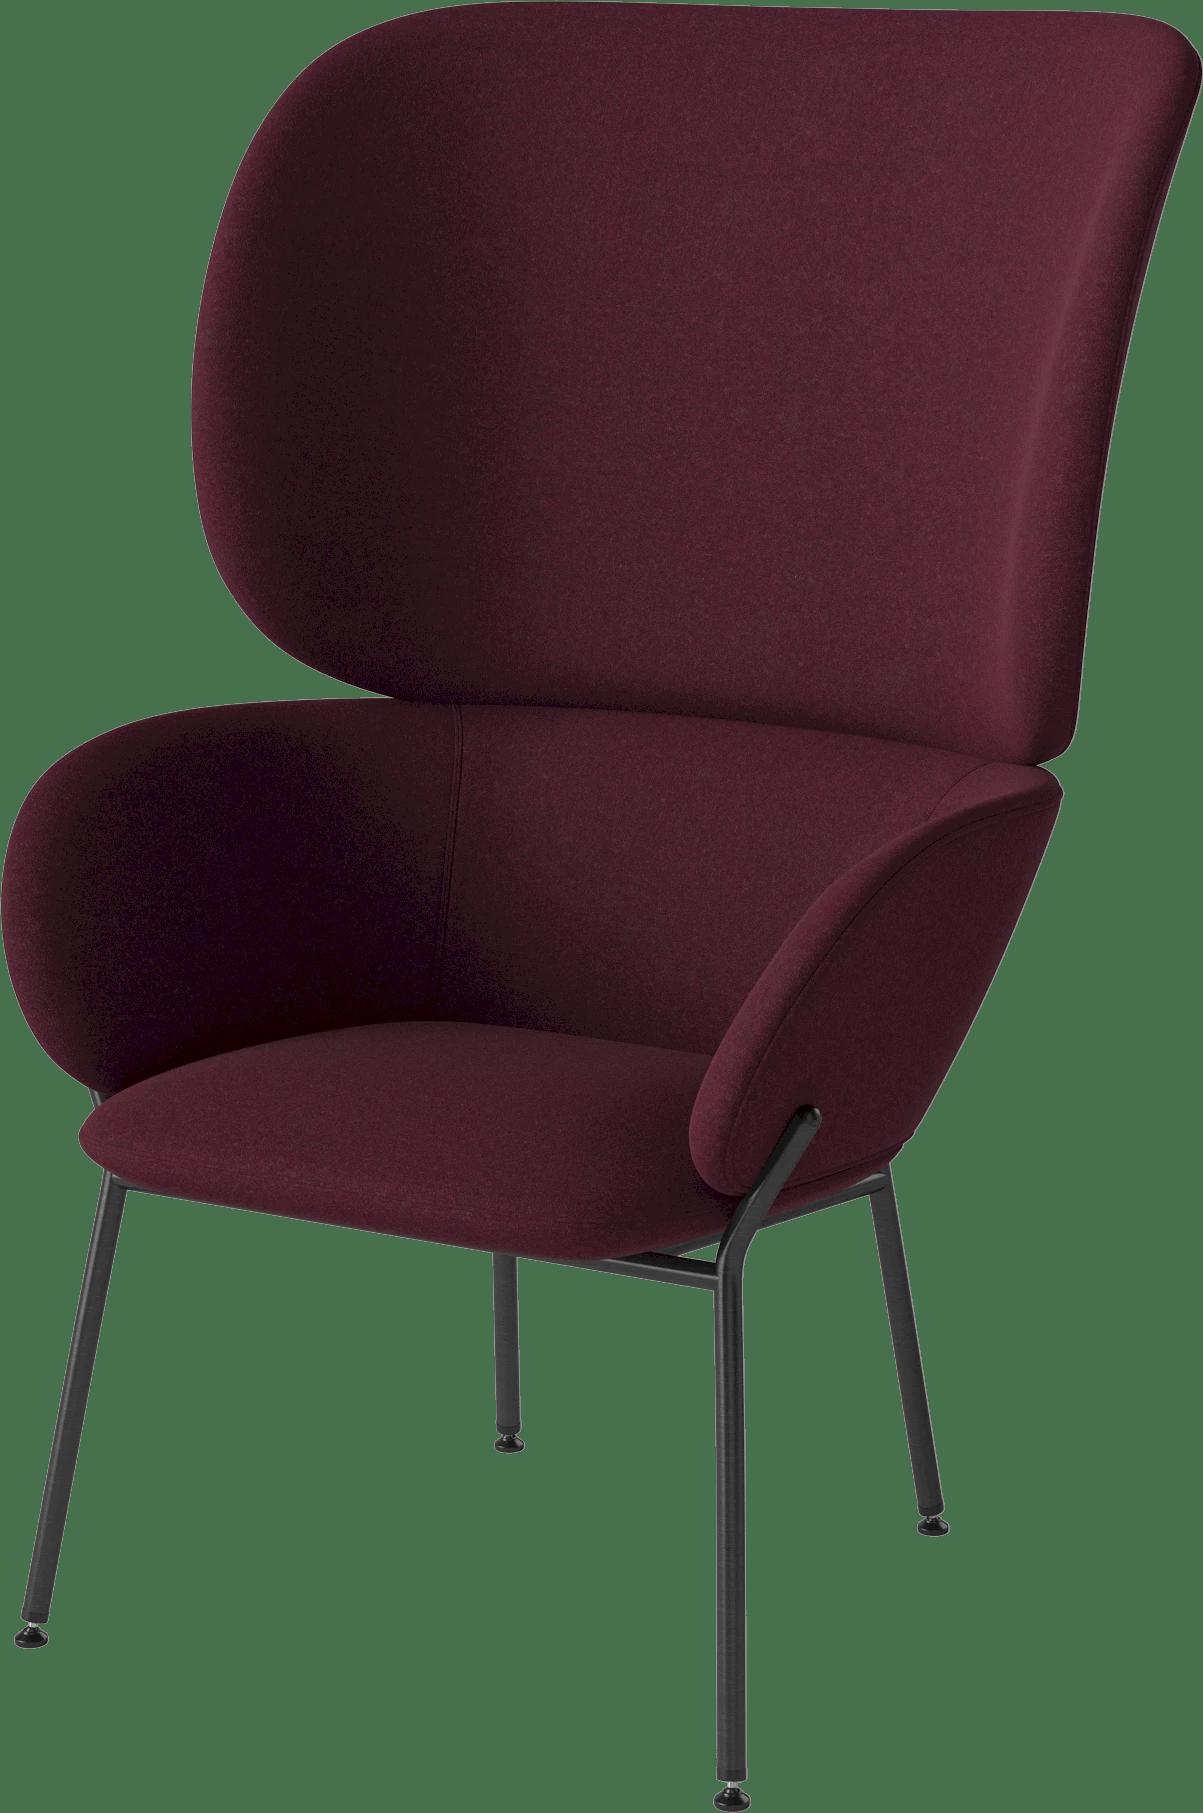 bolia red carmen armchair haute living